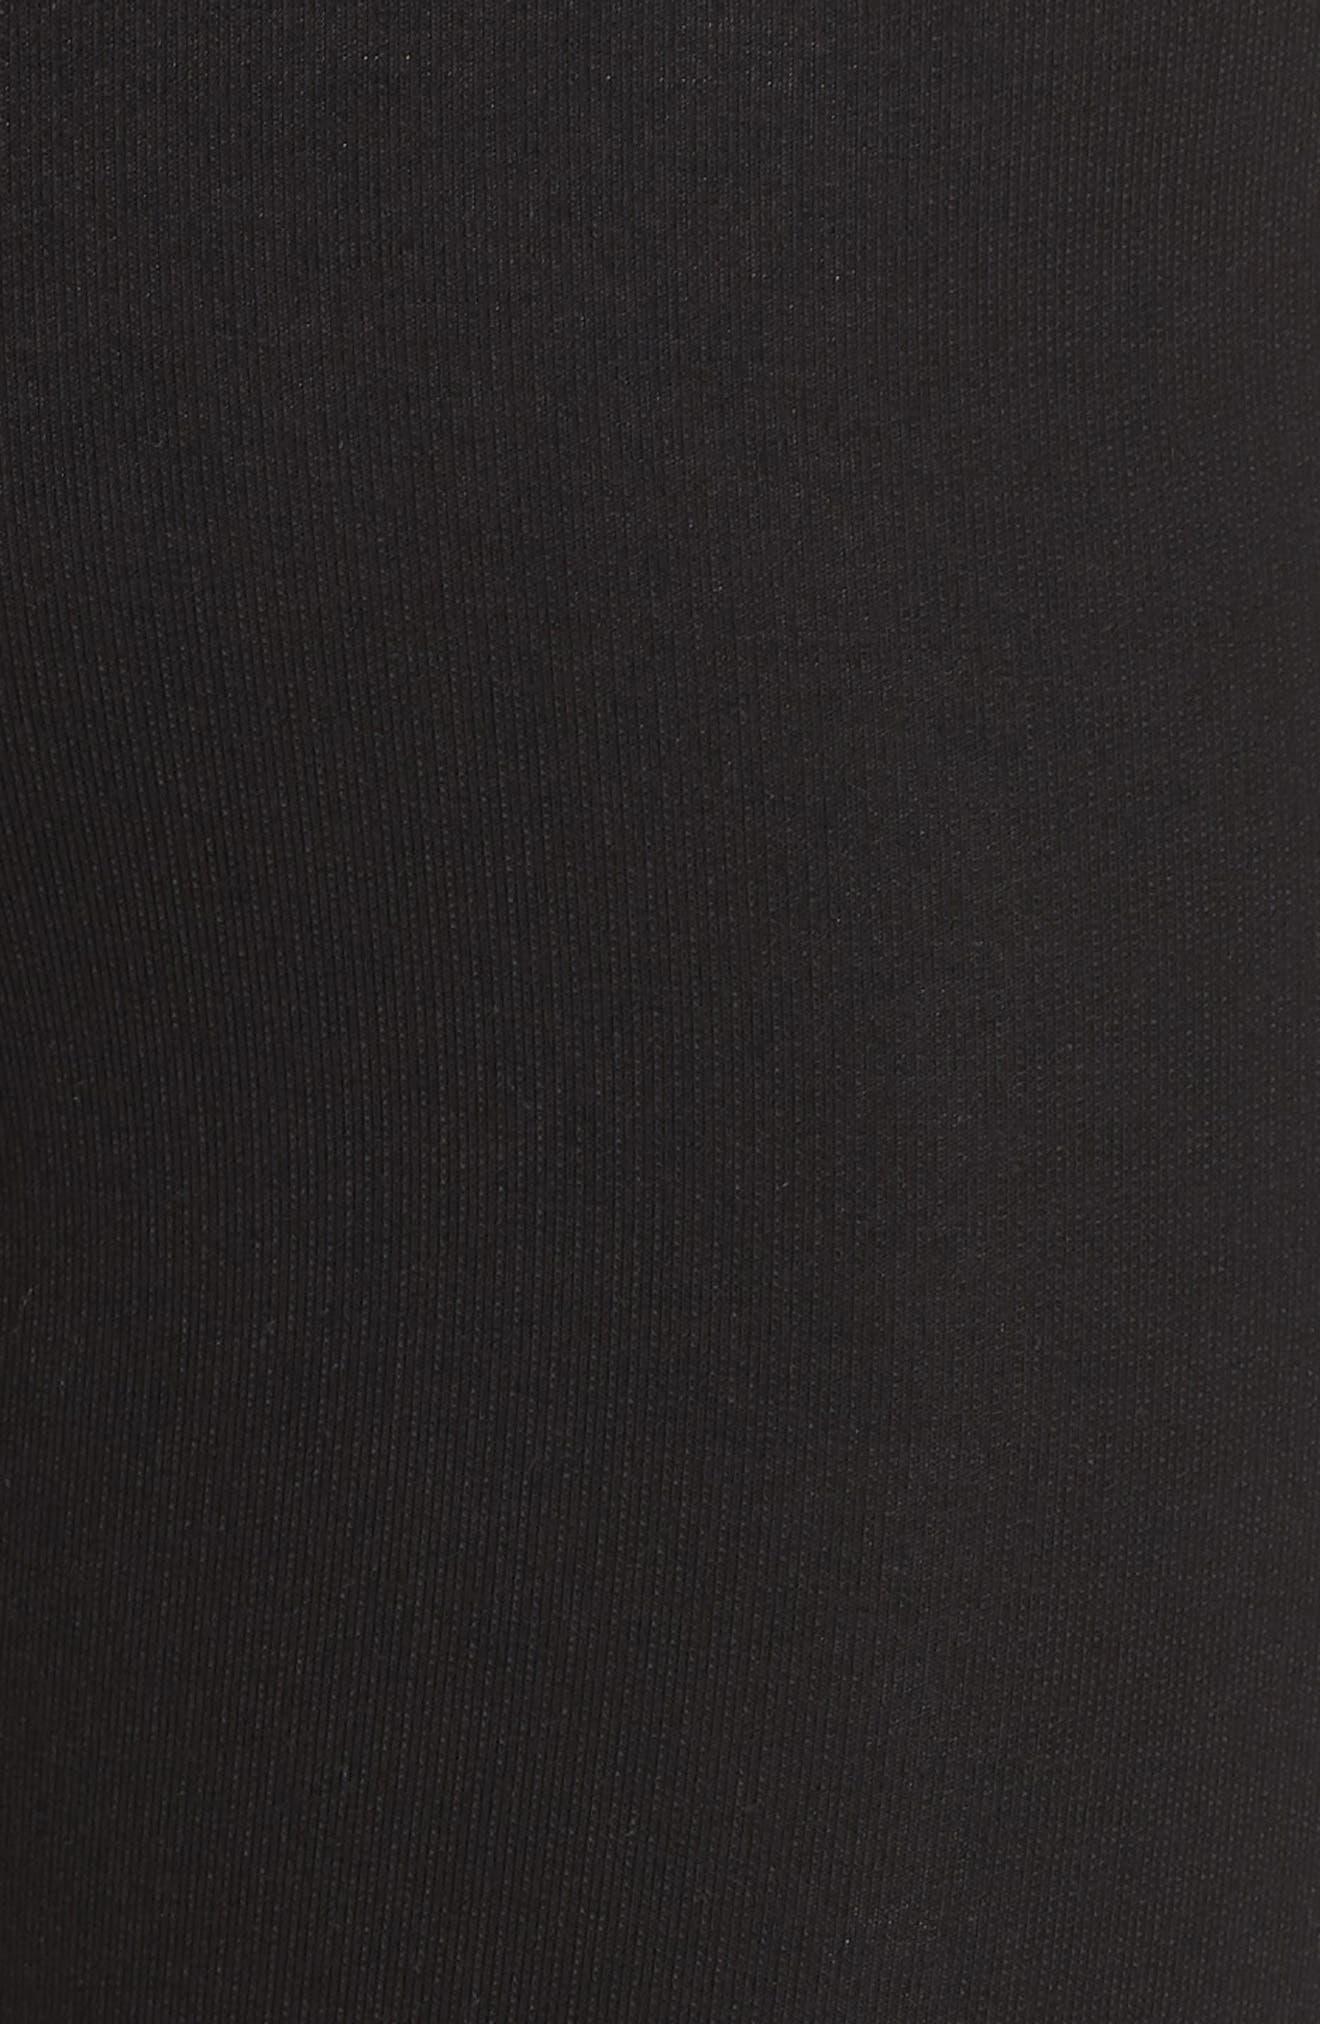 FP Movement Pixi Lace-Up Leggings,                             Alternate thumbnail 6, color,                             BLACK